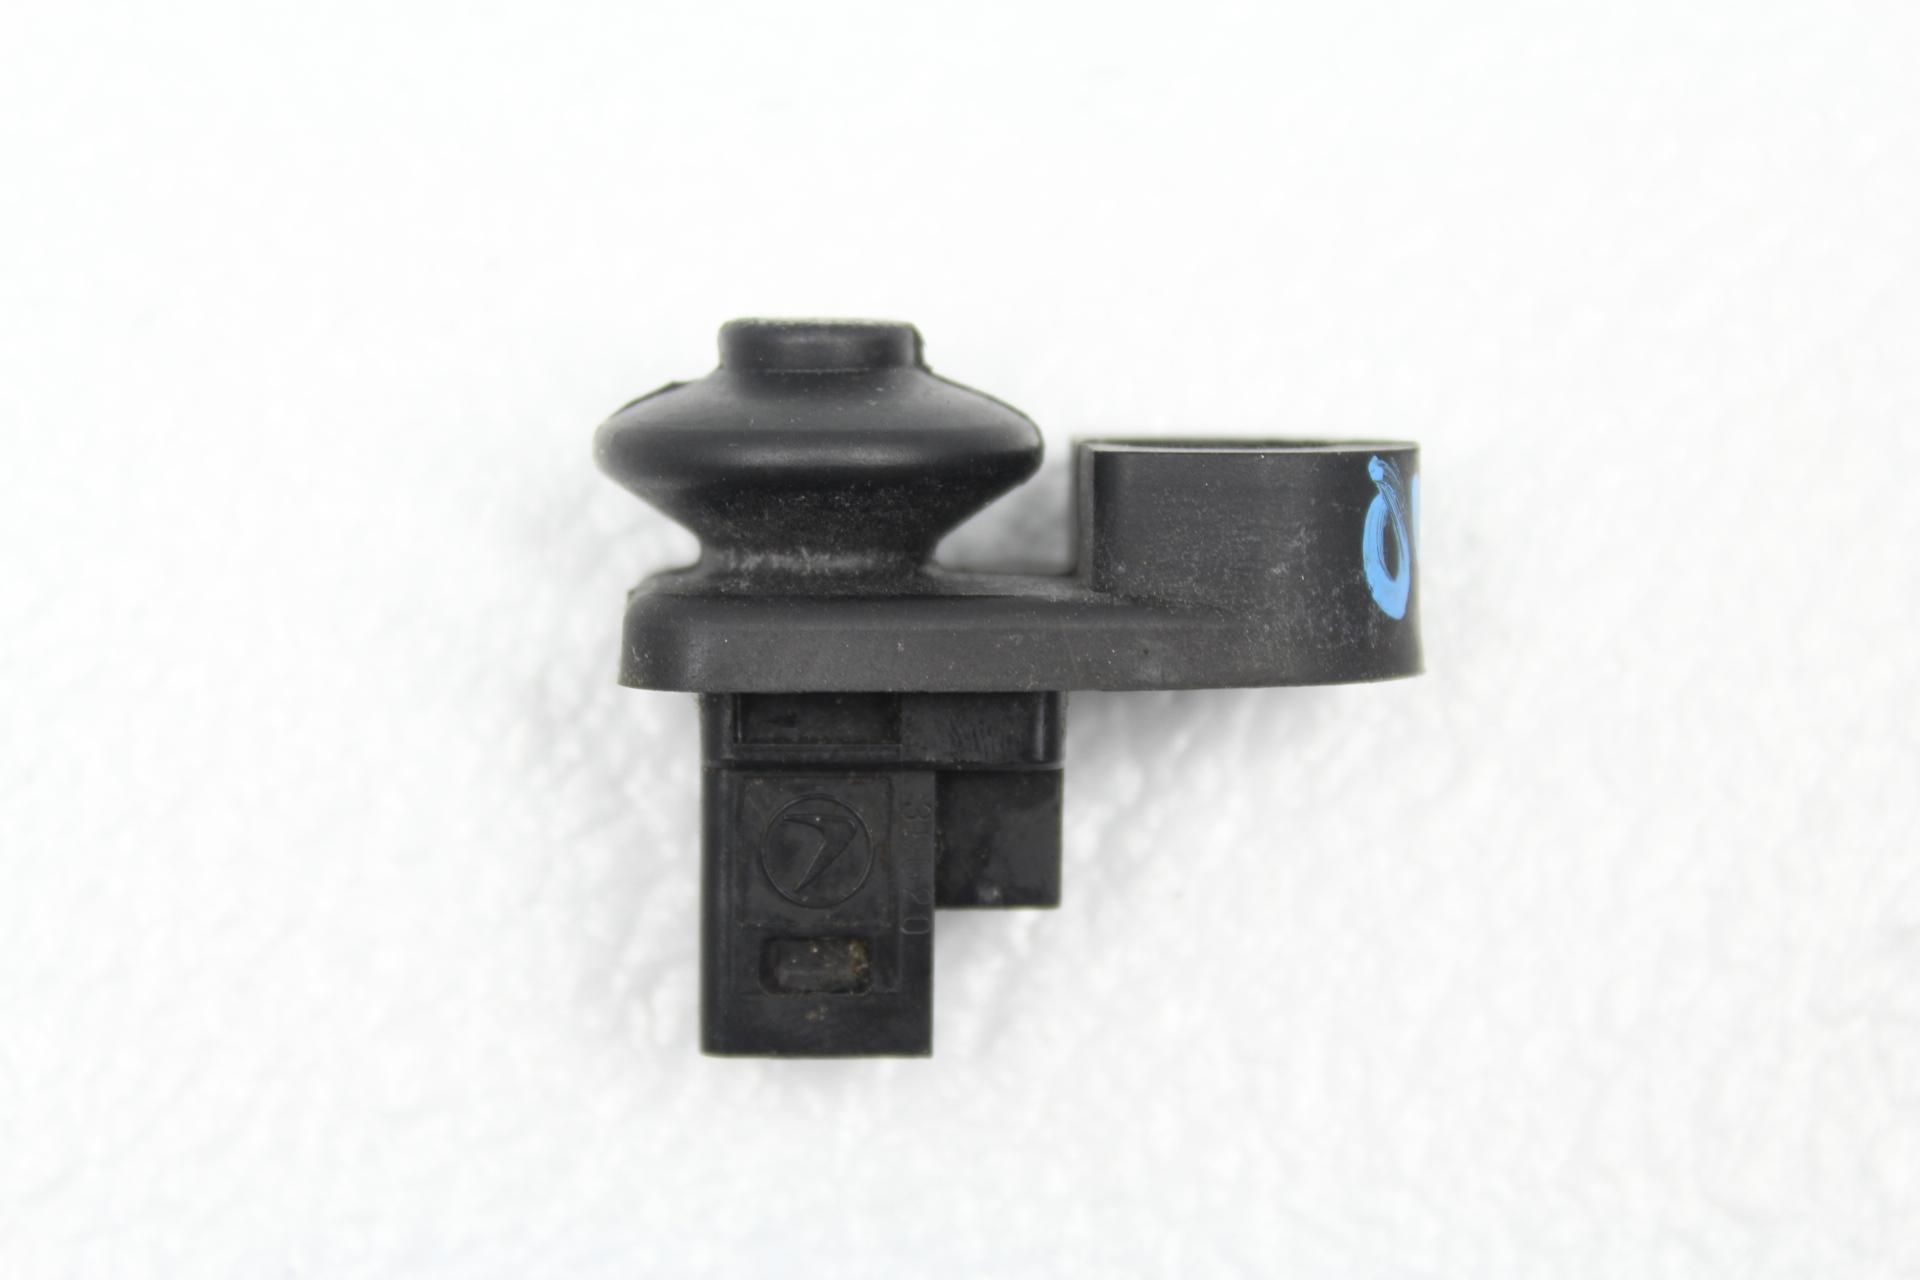 2002-2007 Subaru Impreza WRX STI Door Ajar Sensor Jamb Switch 02-07